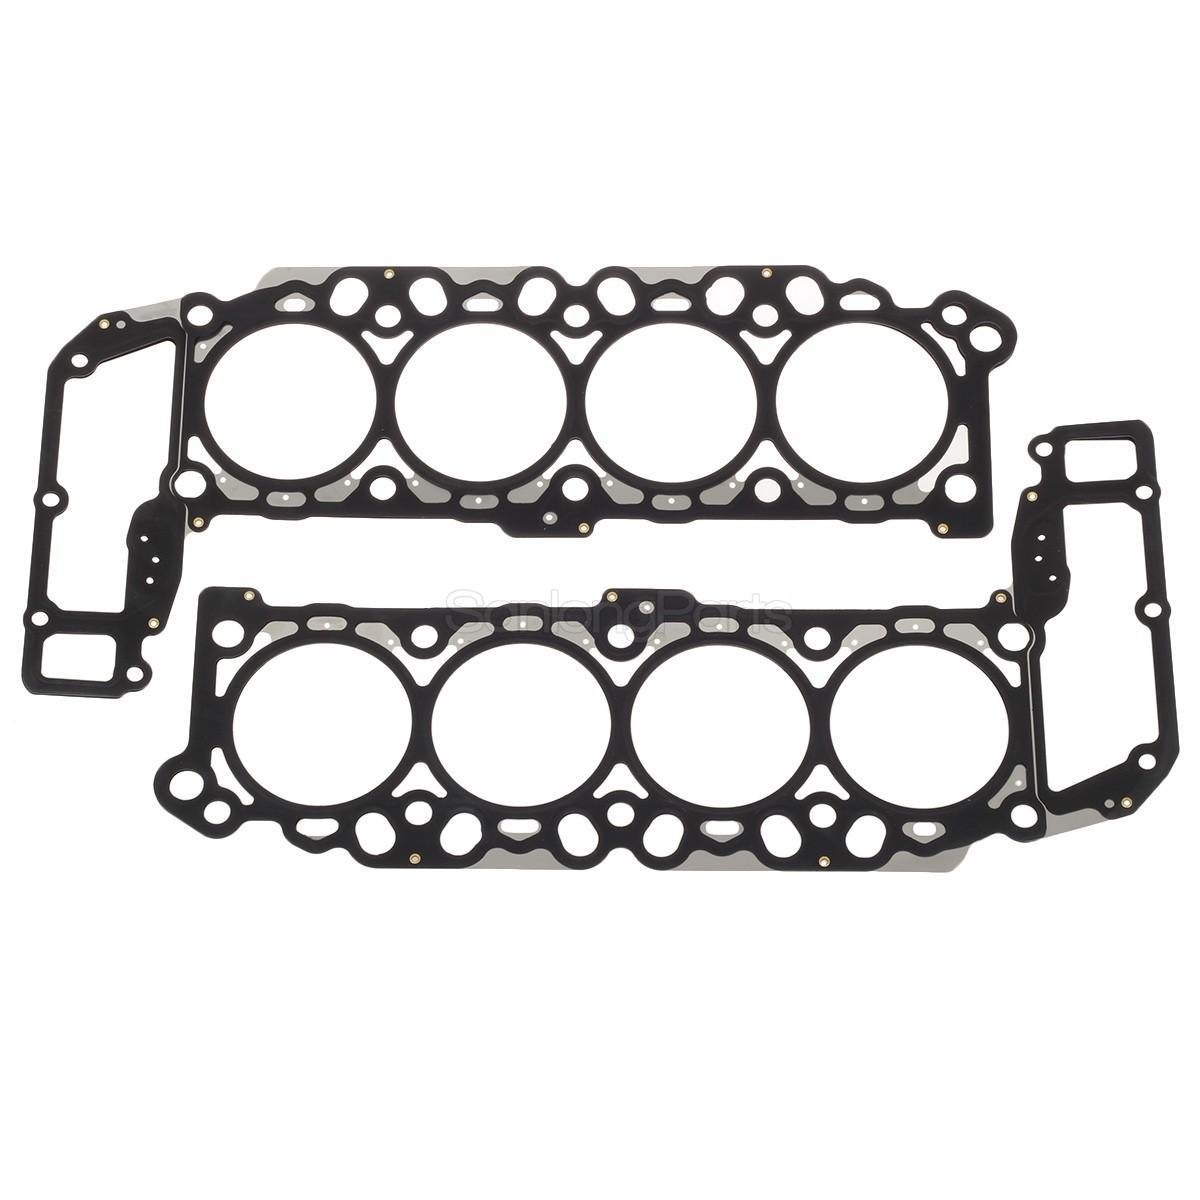 Cylinder Head Gasket Kit for Dodge Dakota Durango RAM for